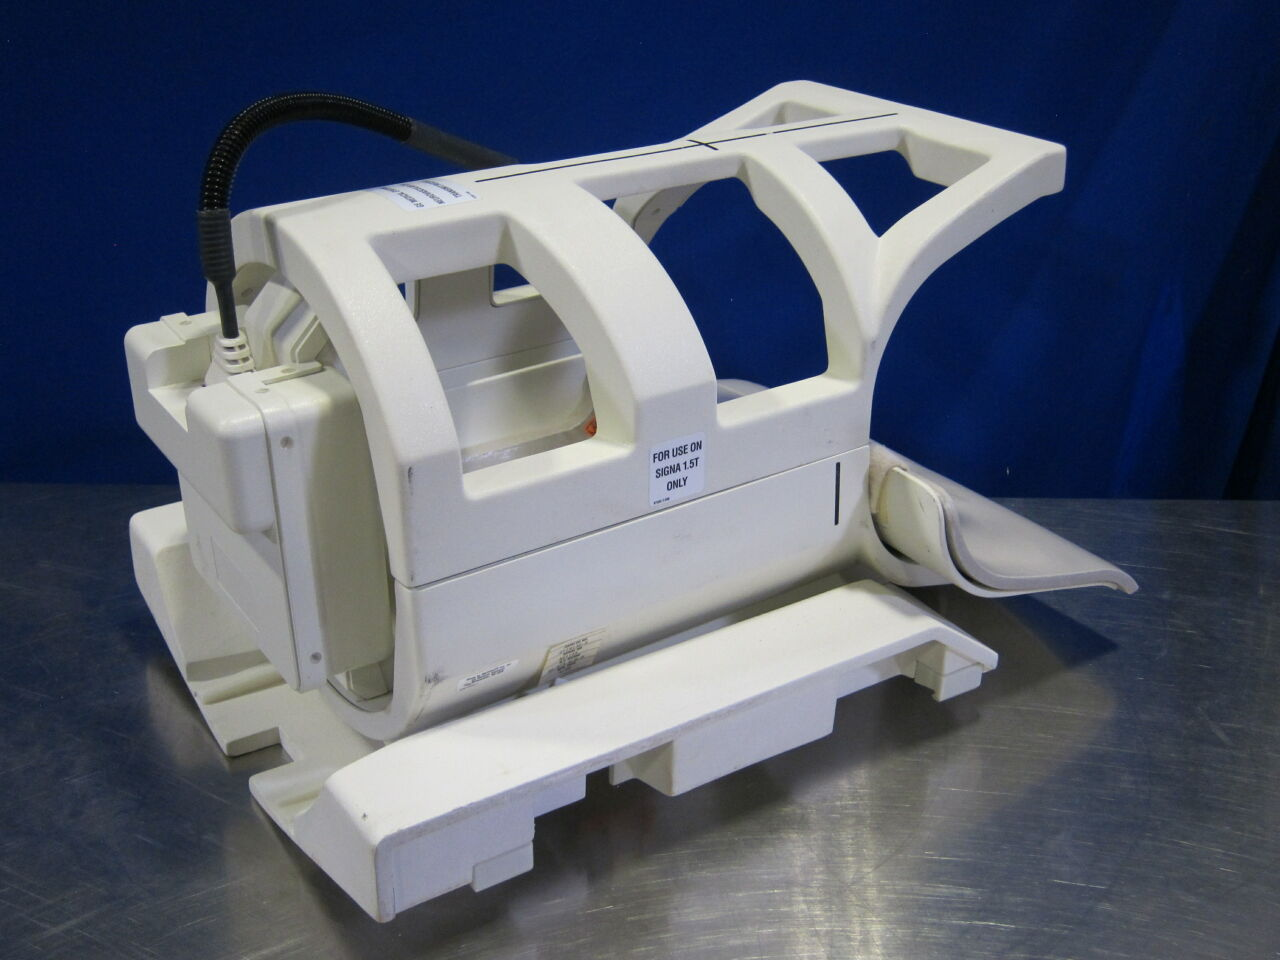 GE 1.5T Neurovascular MRI Coil